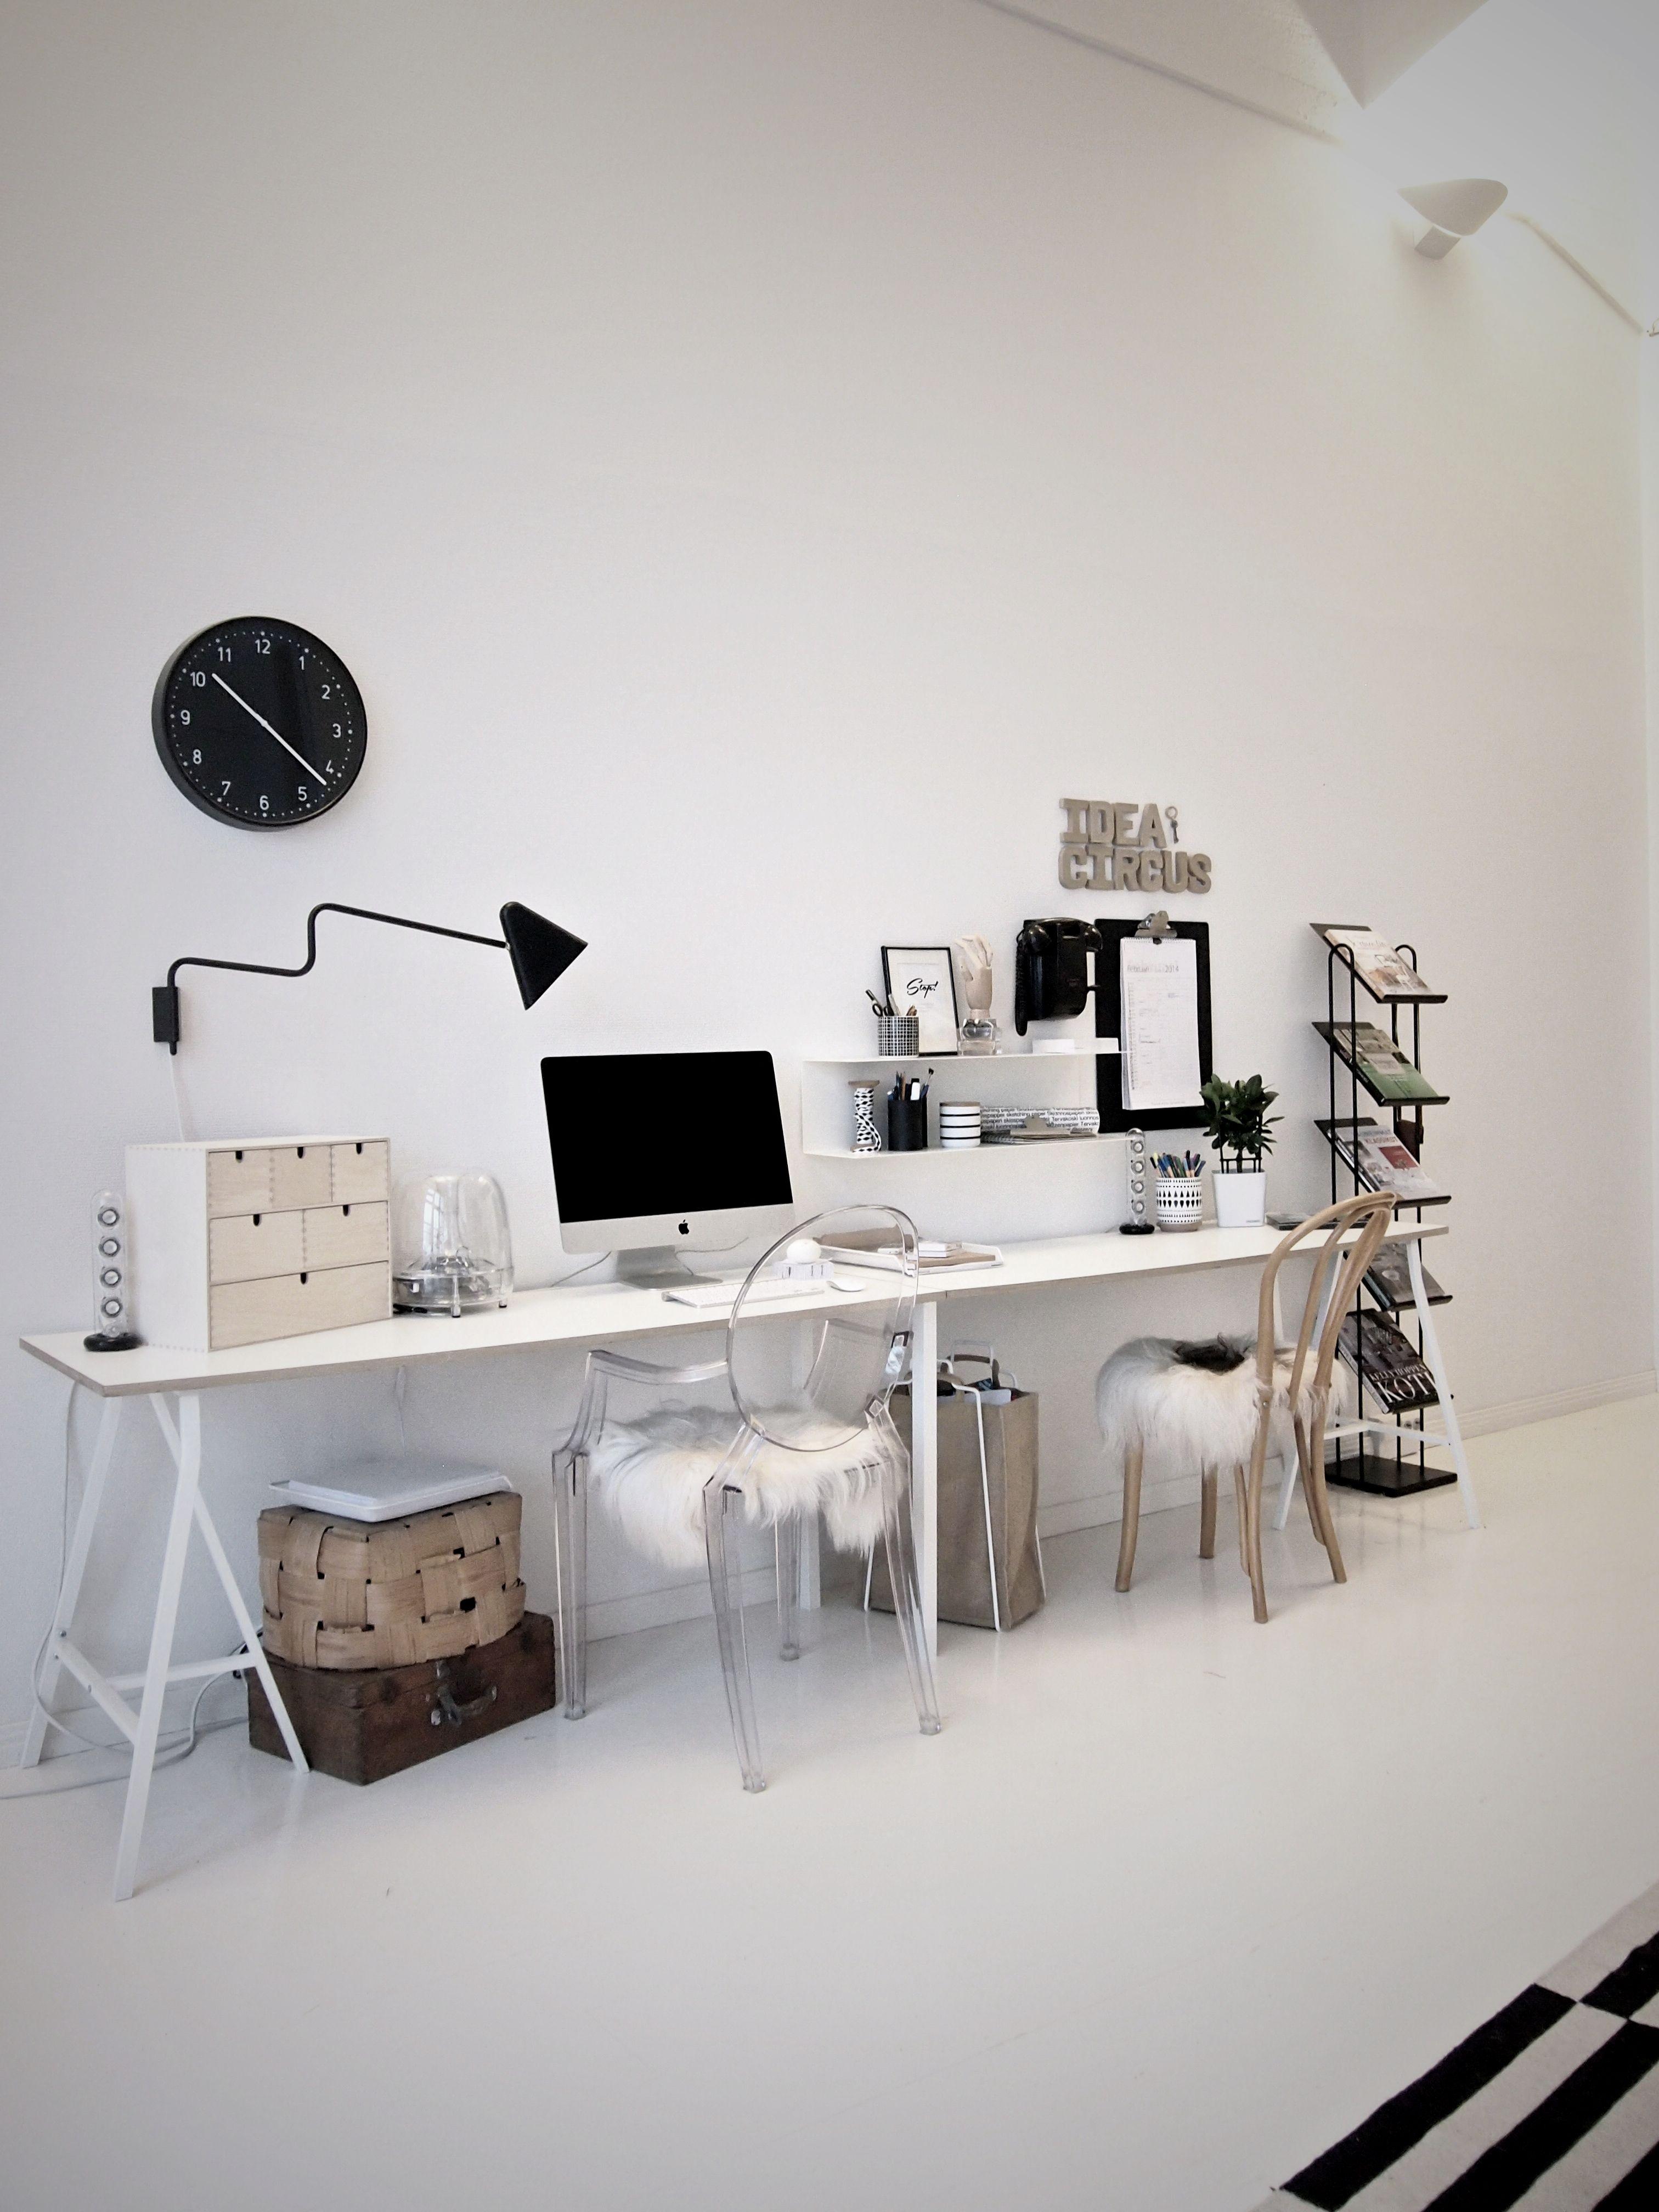 IDEACIRCUS HOME OFFICE